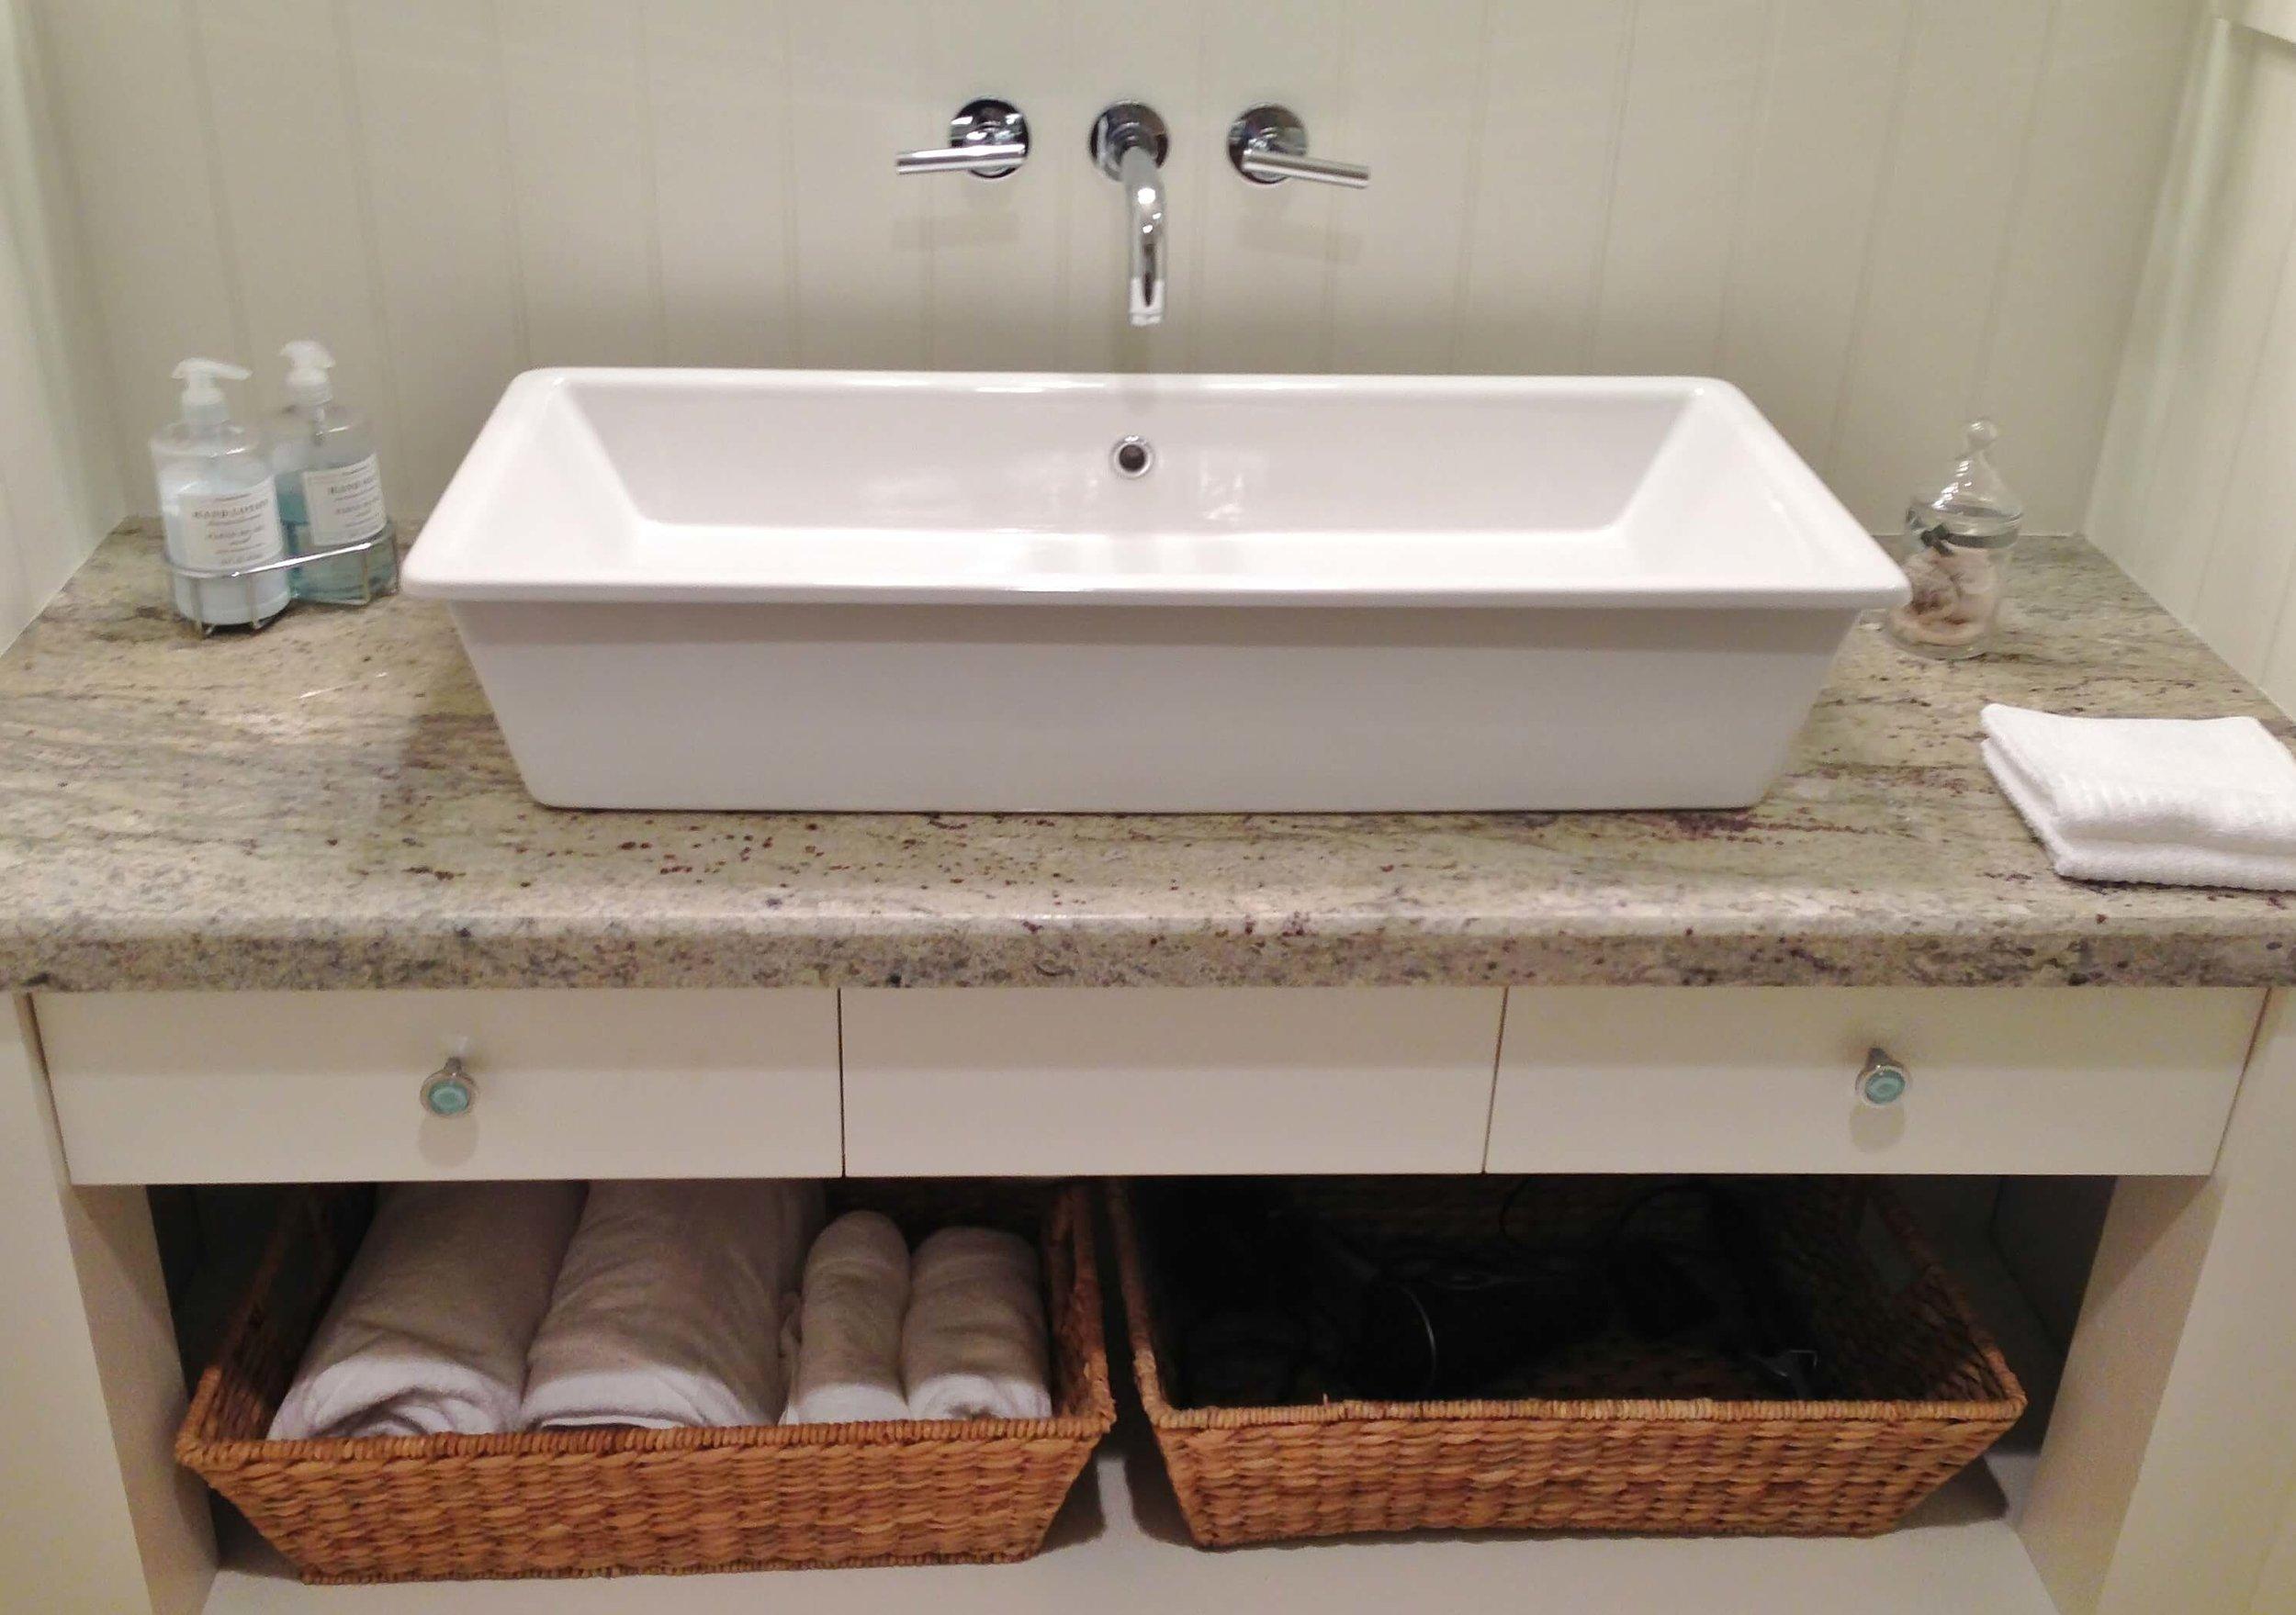 Ventura hs -Guest bath.JPG